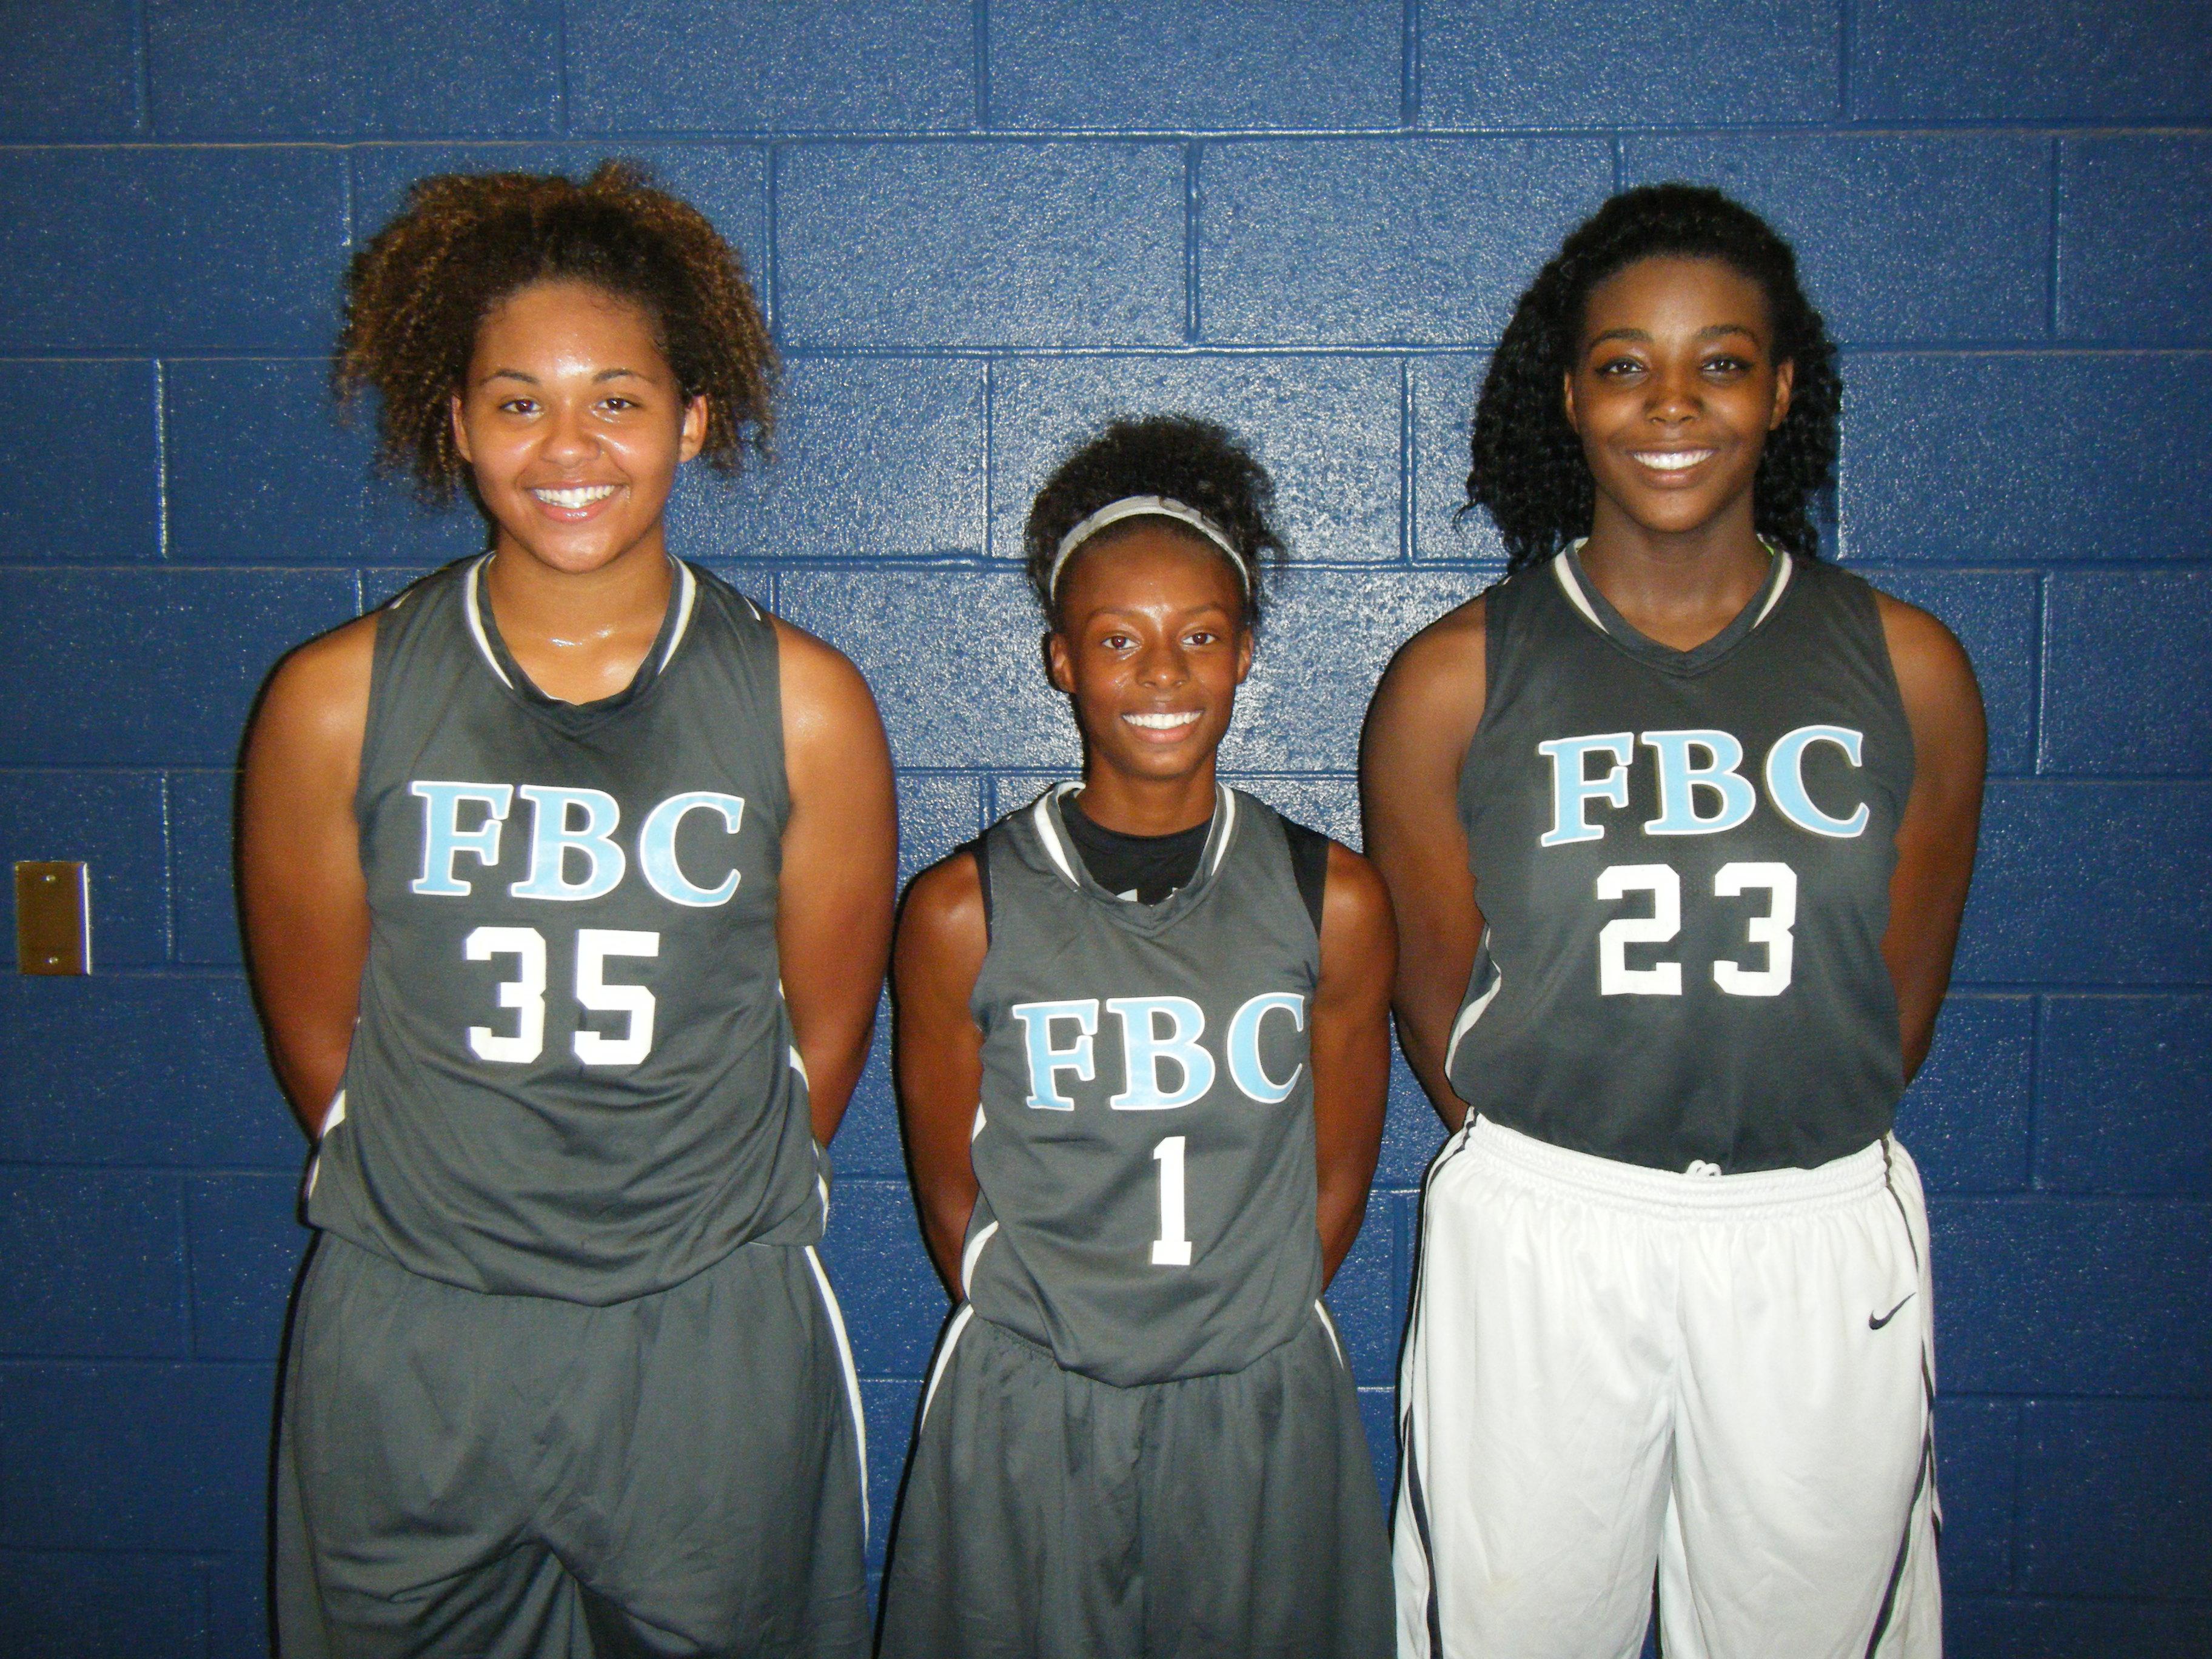 Javyn Nicholson, Bria Harmon and Jada Rice of FBC Black and Collins Hill High School